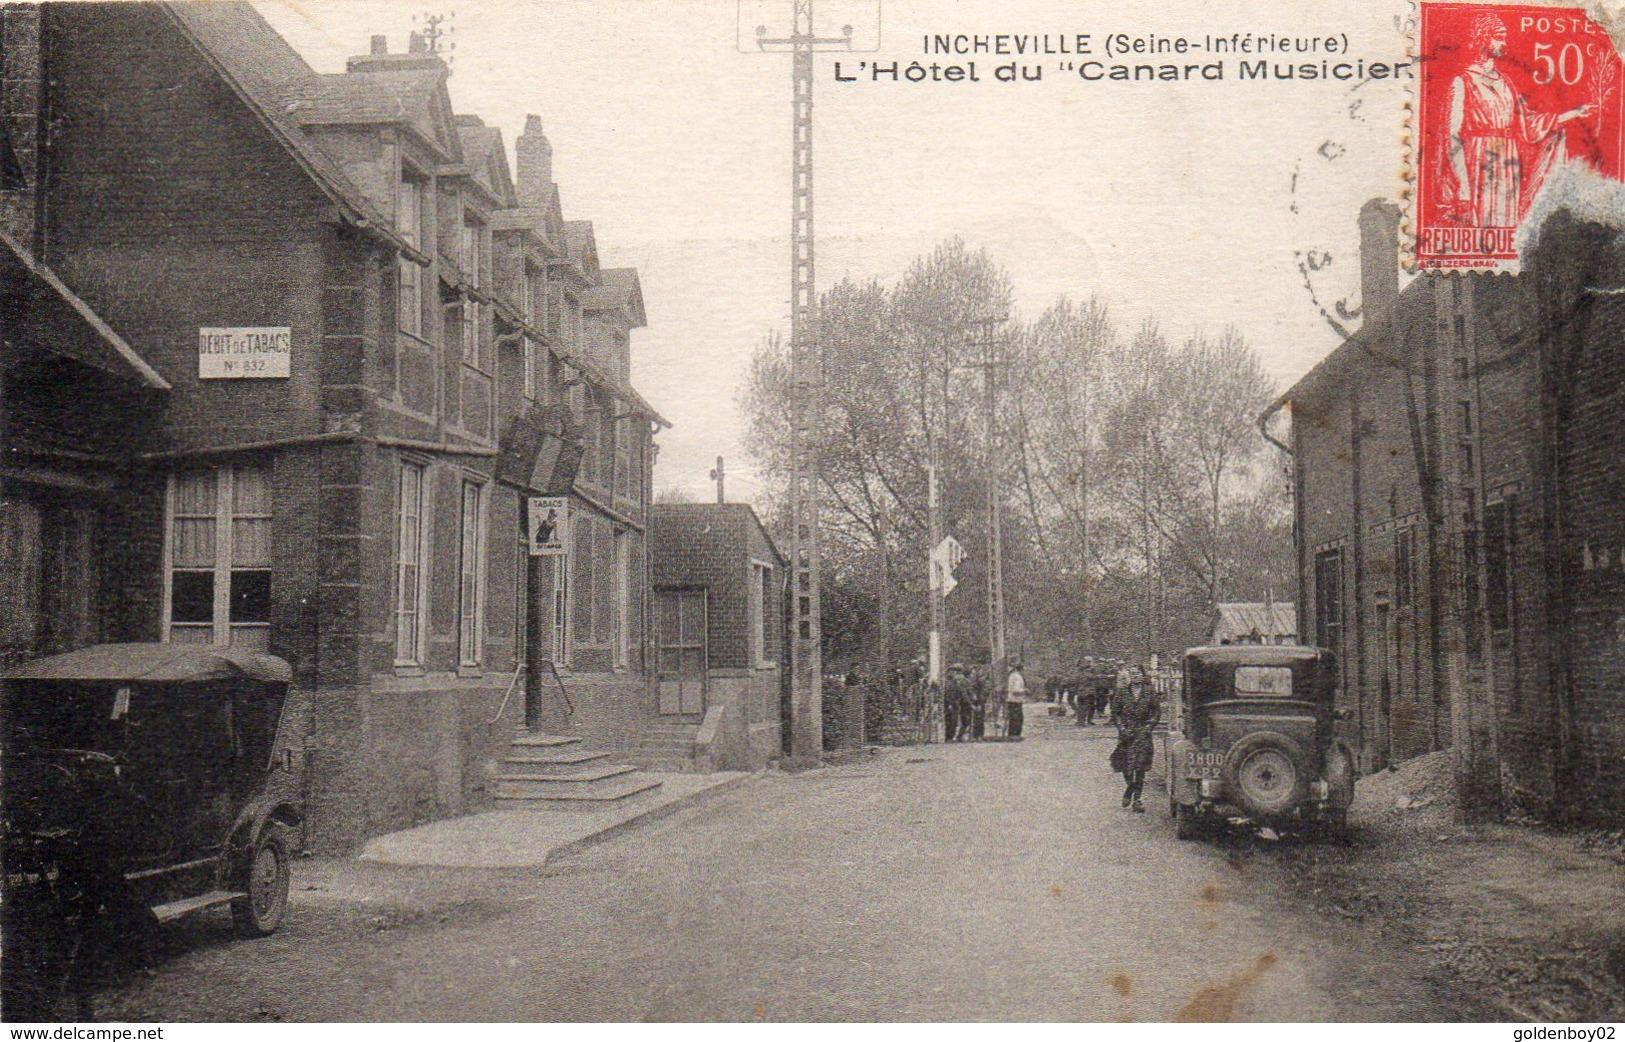 76 Incheville, L'hotel Du Canard Musicien - France